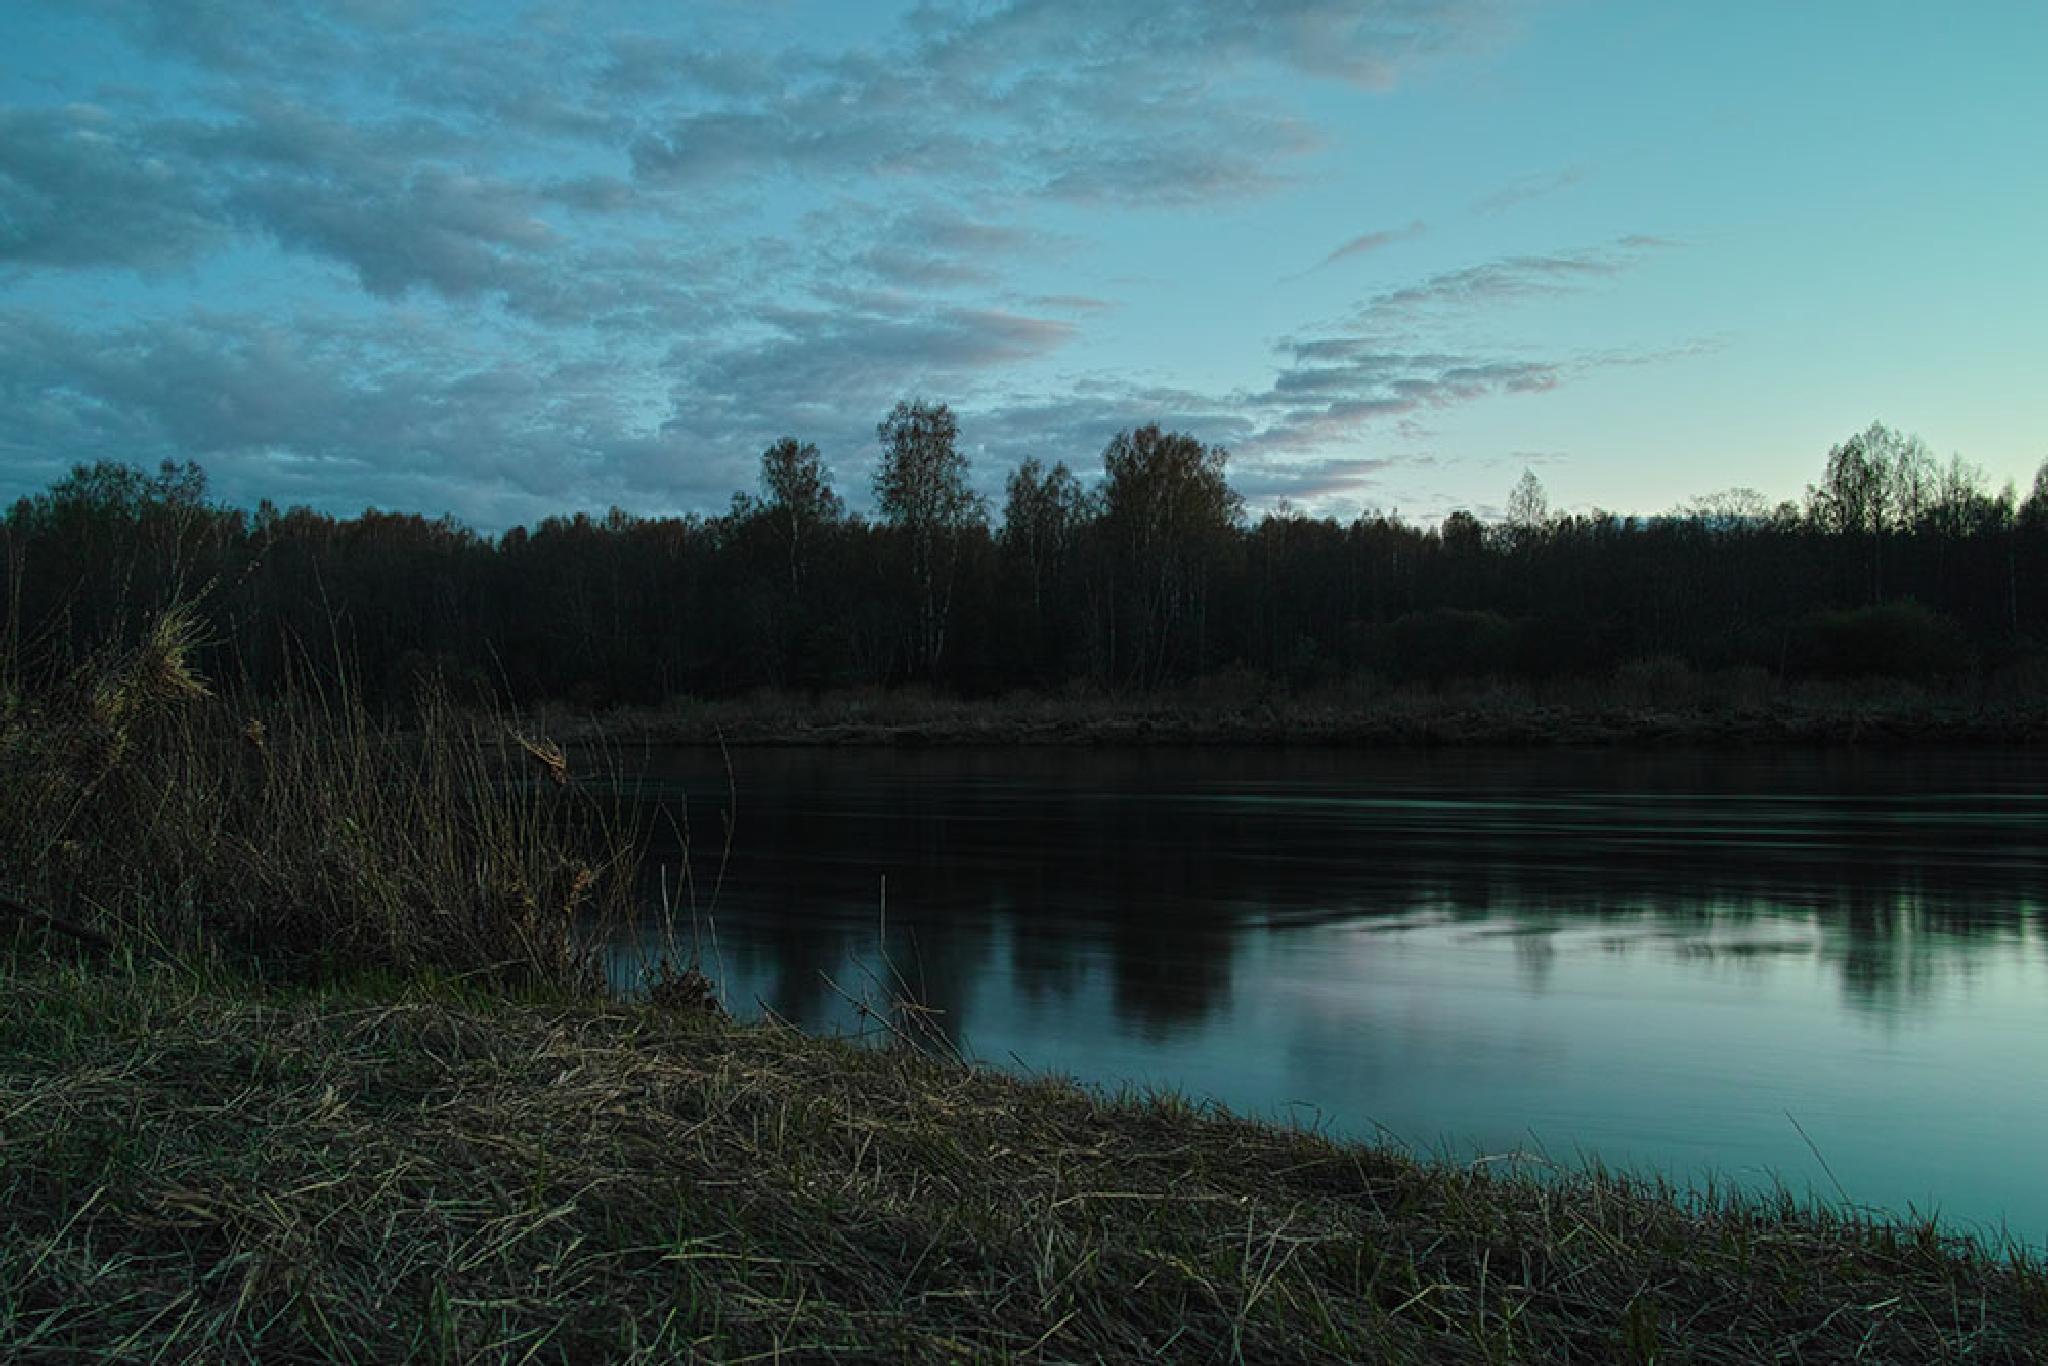 River at night  by sergeytoronto